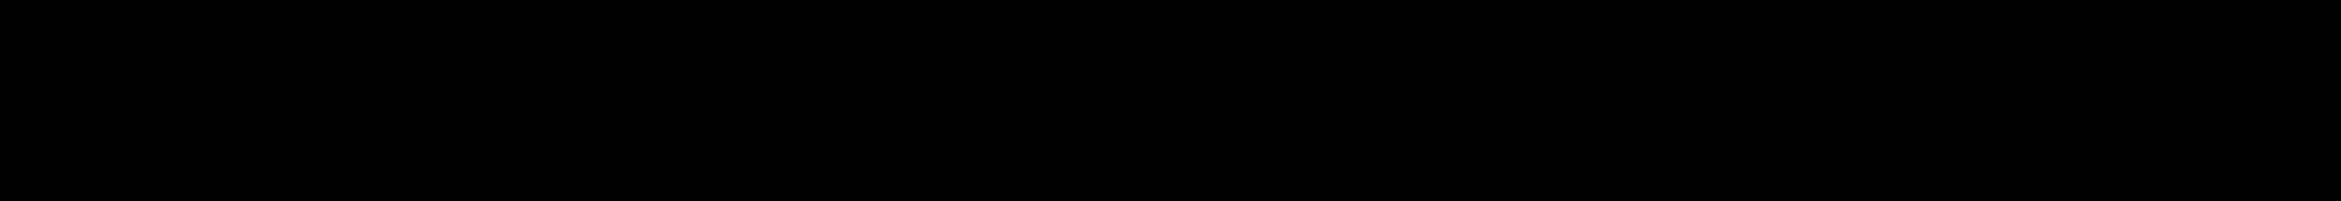 Roihu Extra Black Italic